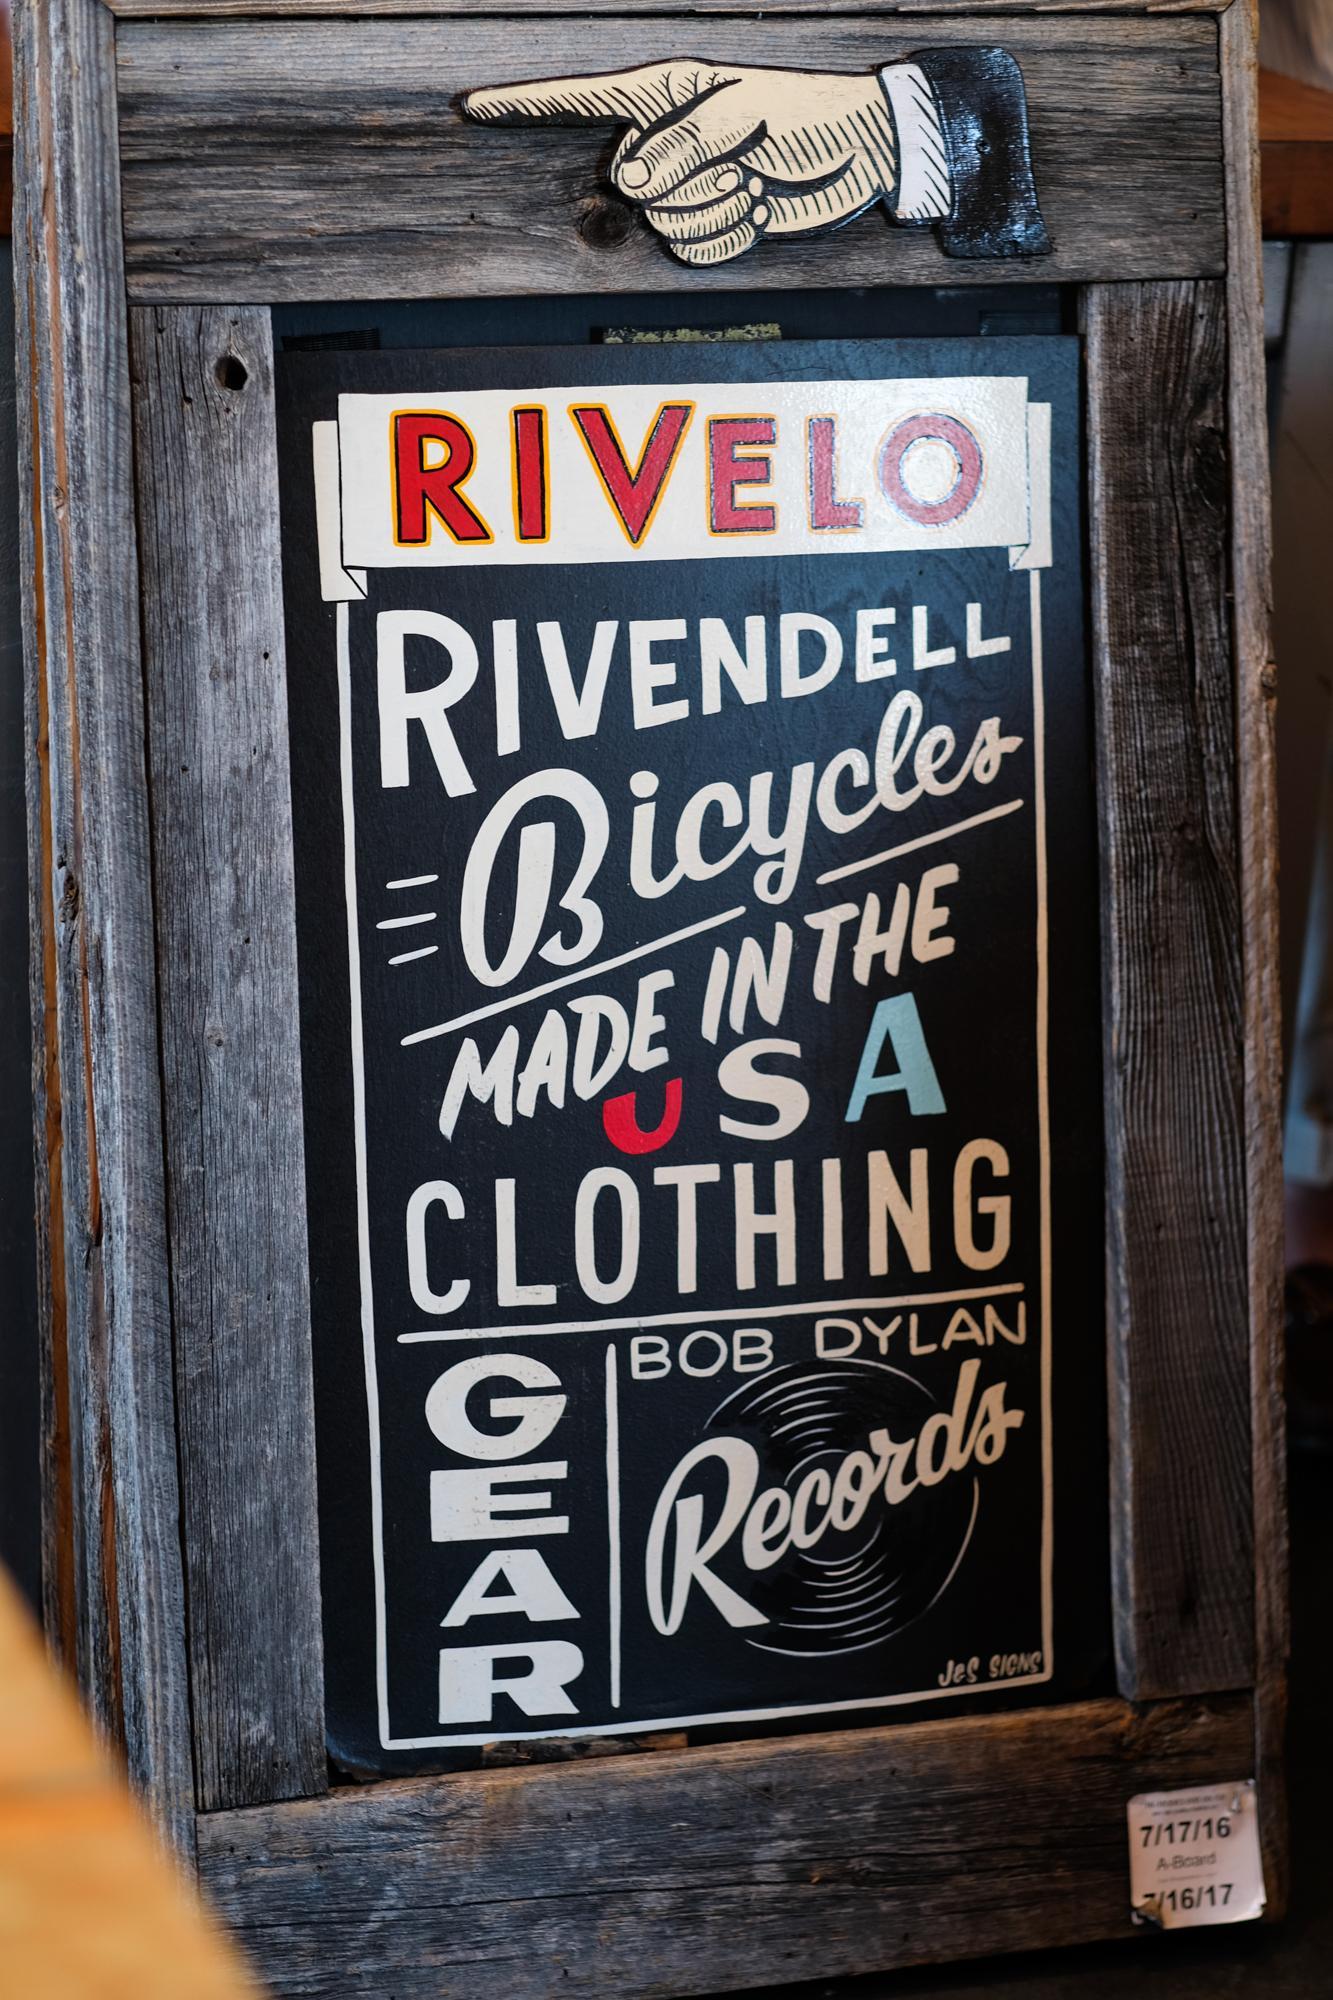 Portland's Rivelo